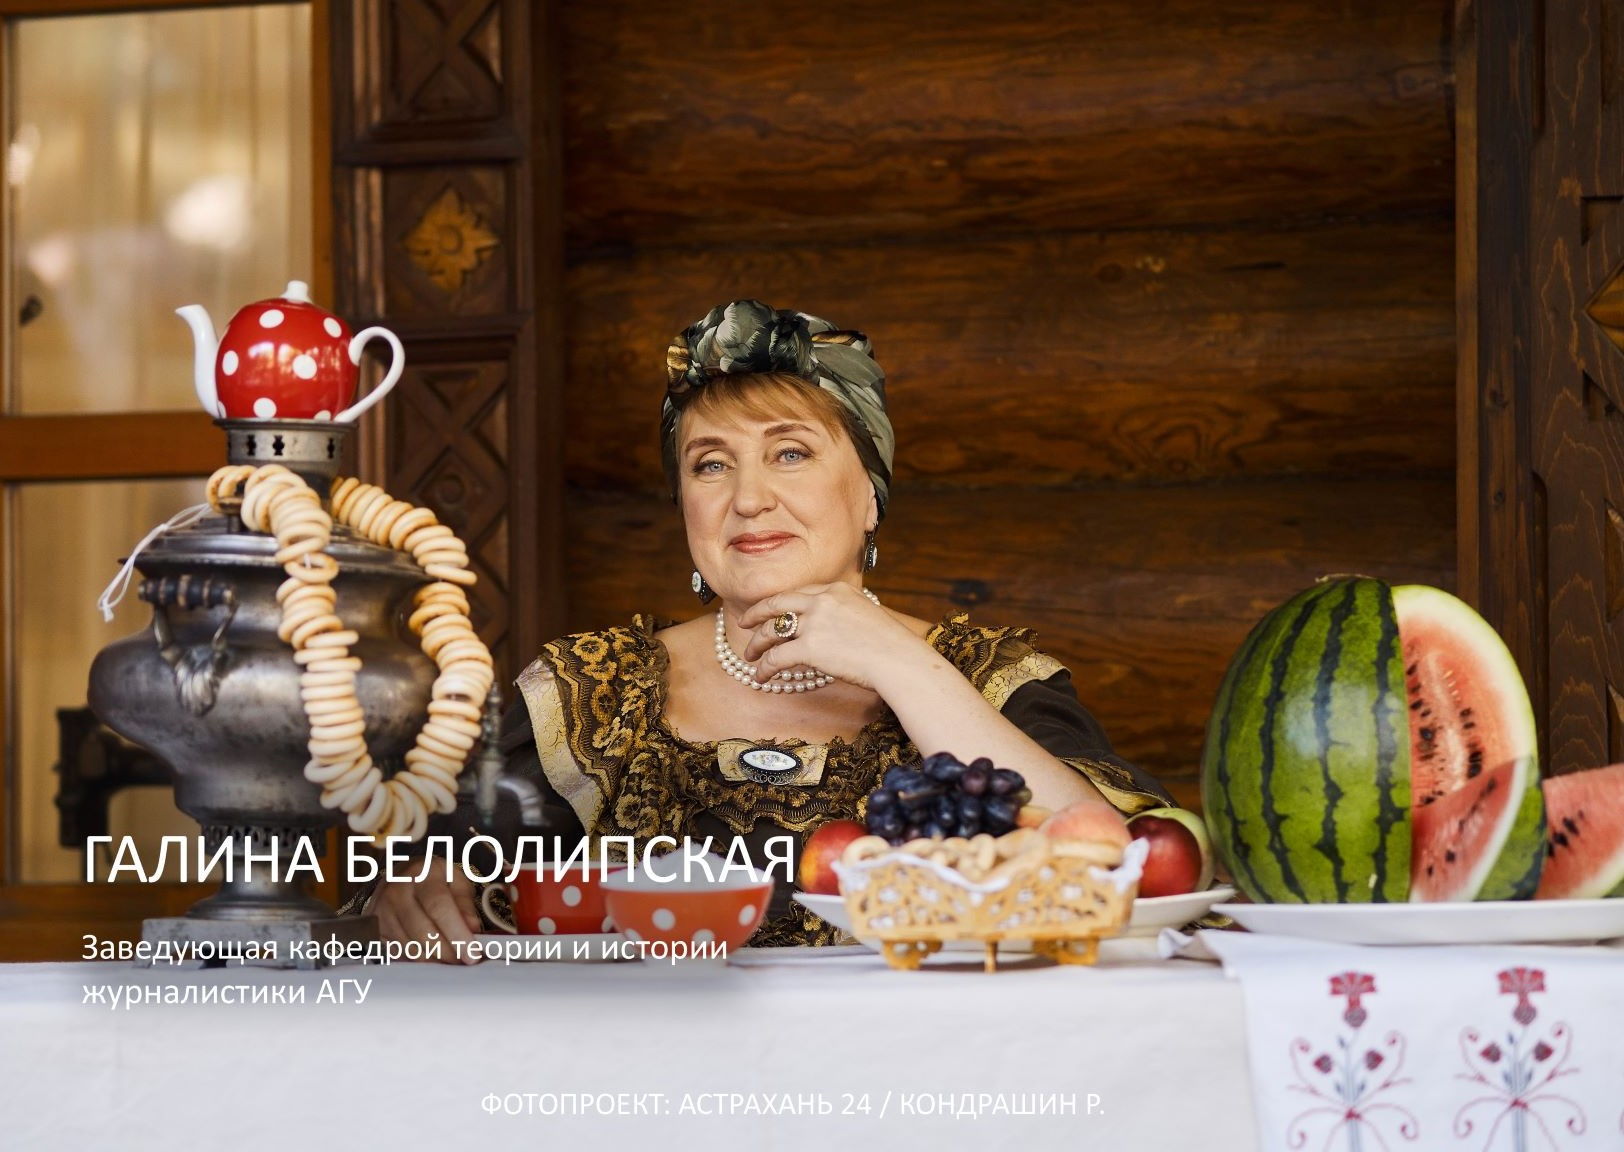 Мы родом из Астрахани. Галина